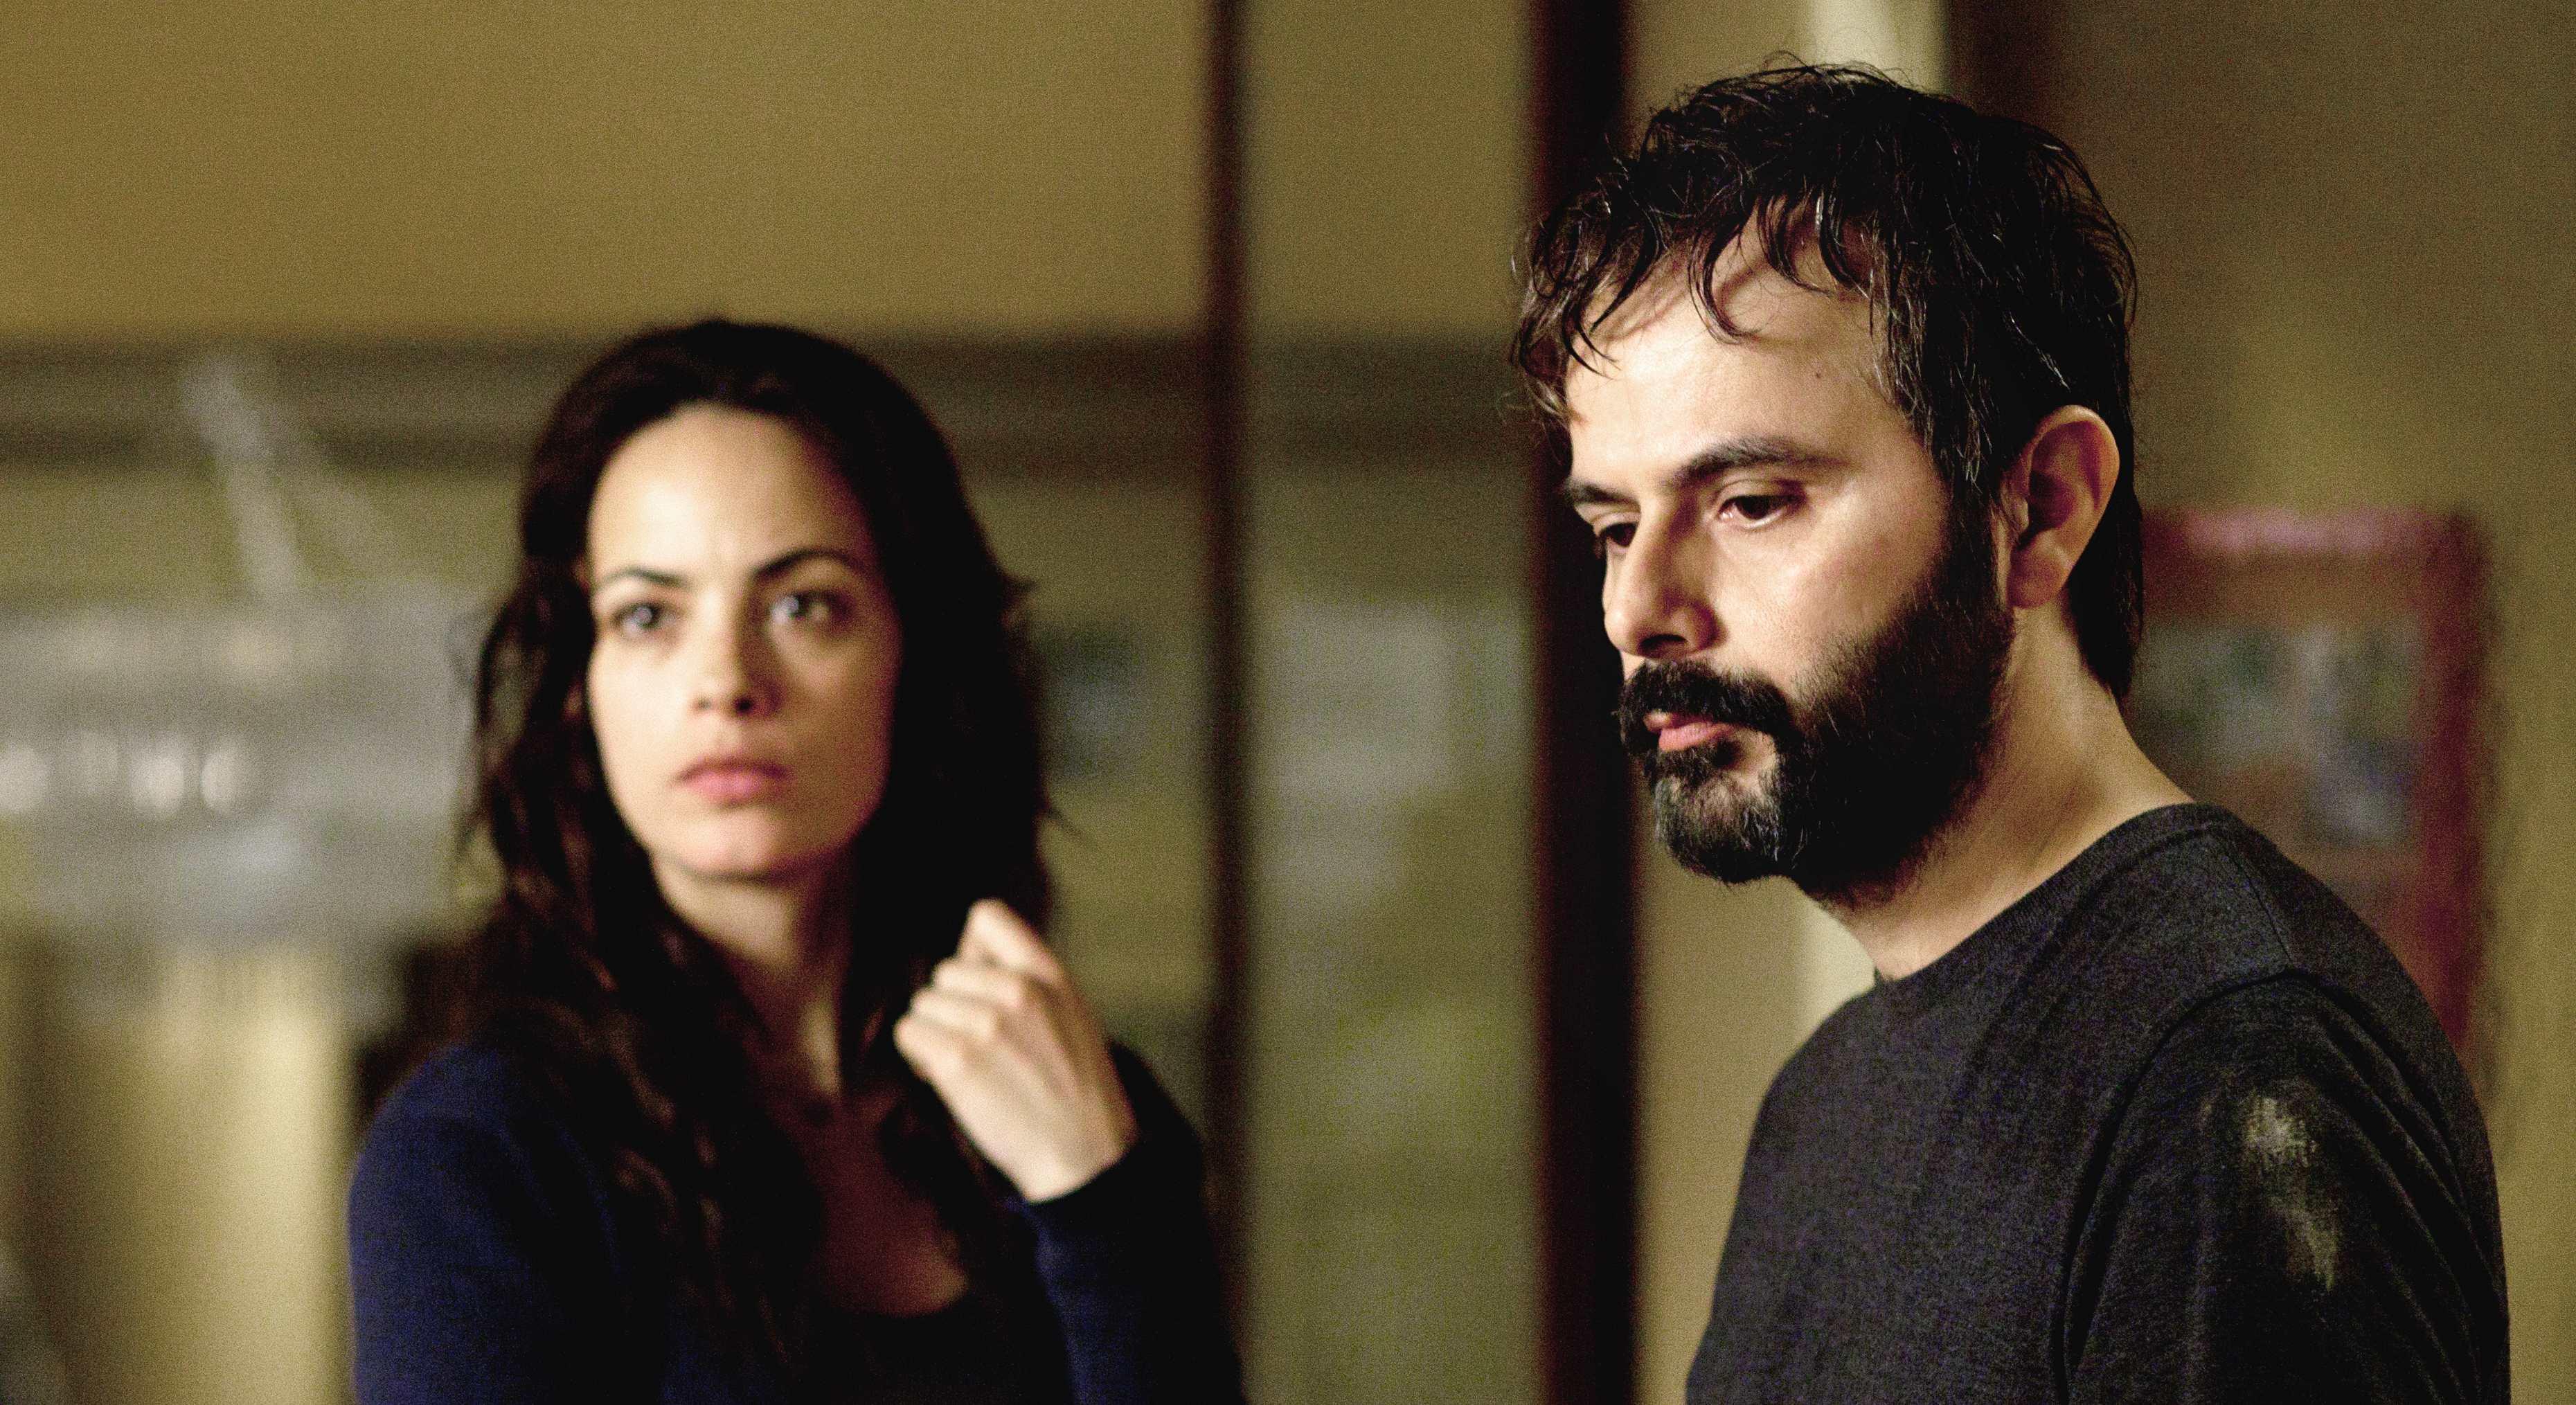 Le Passé – Das Vergangene (2013) Filmkritik